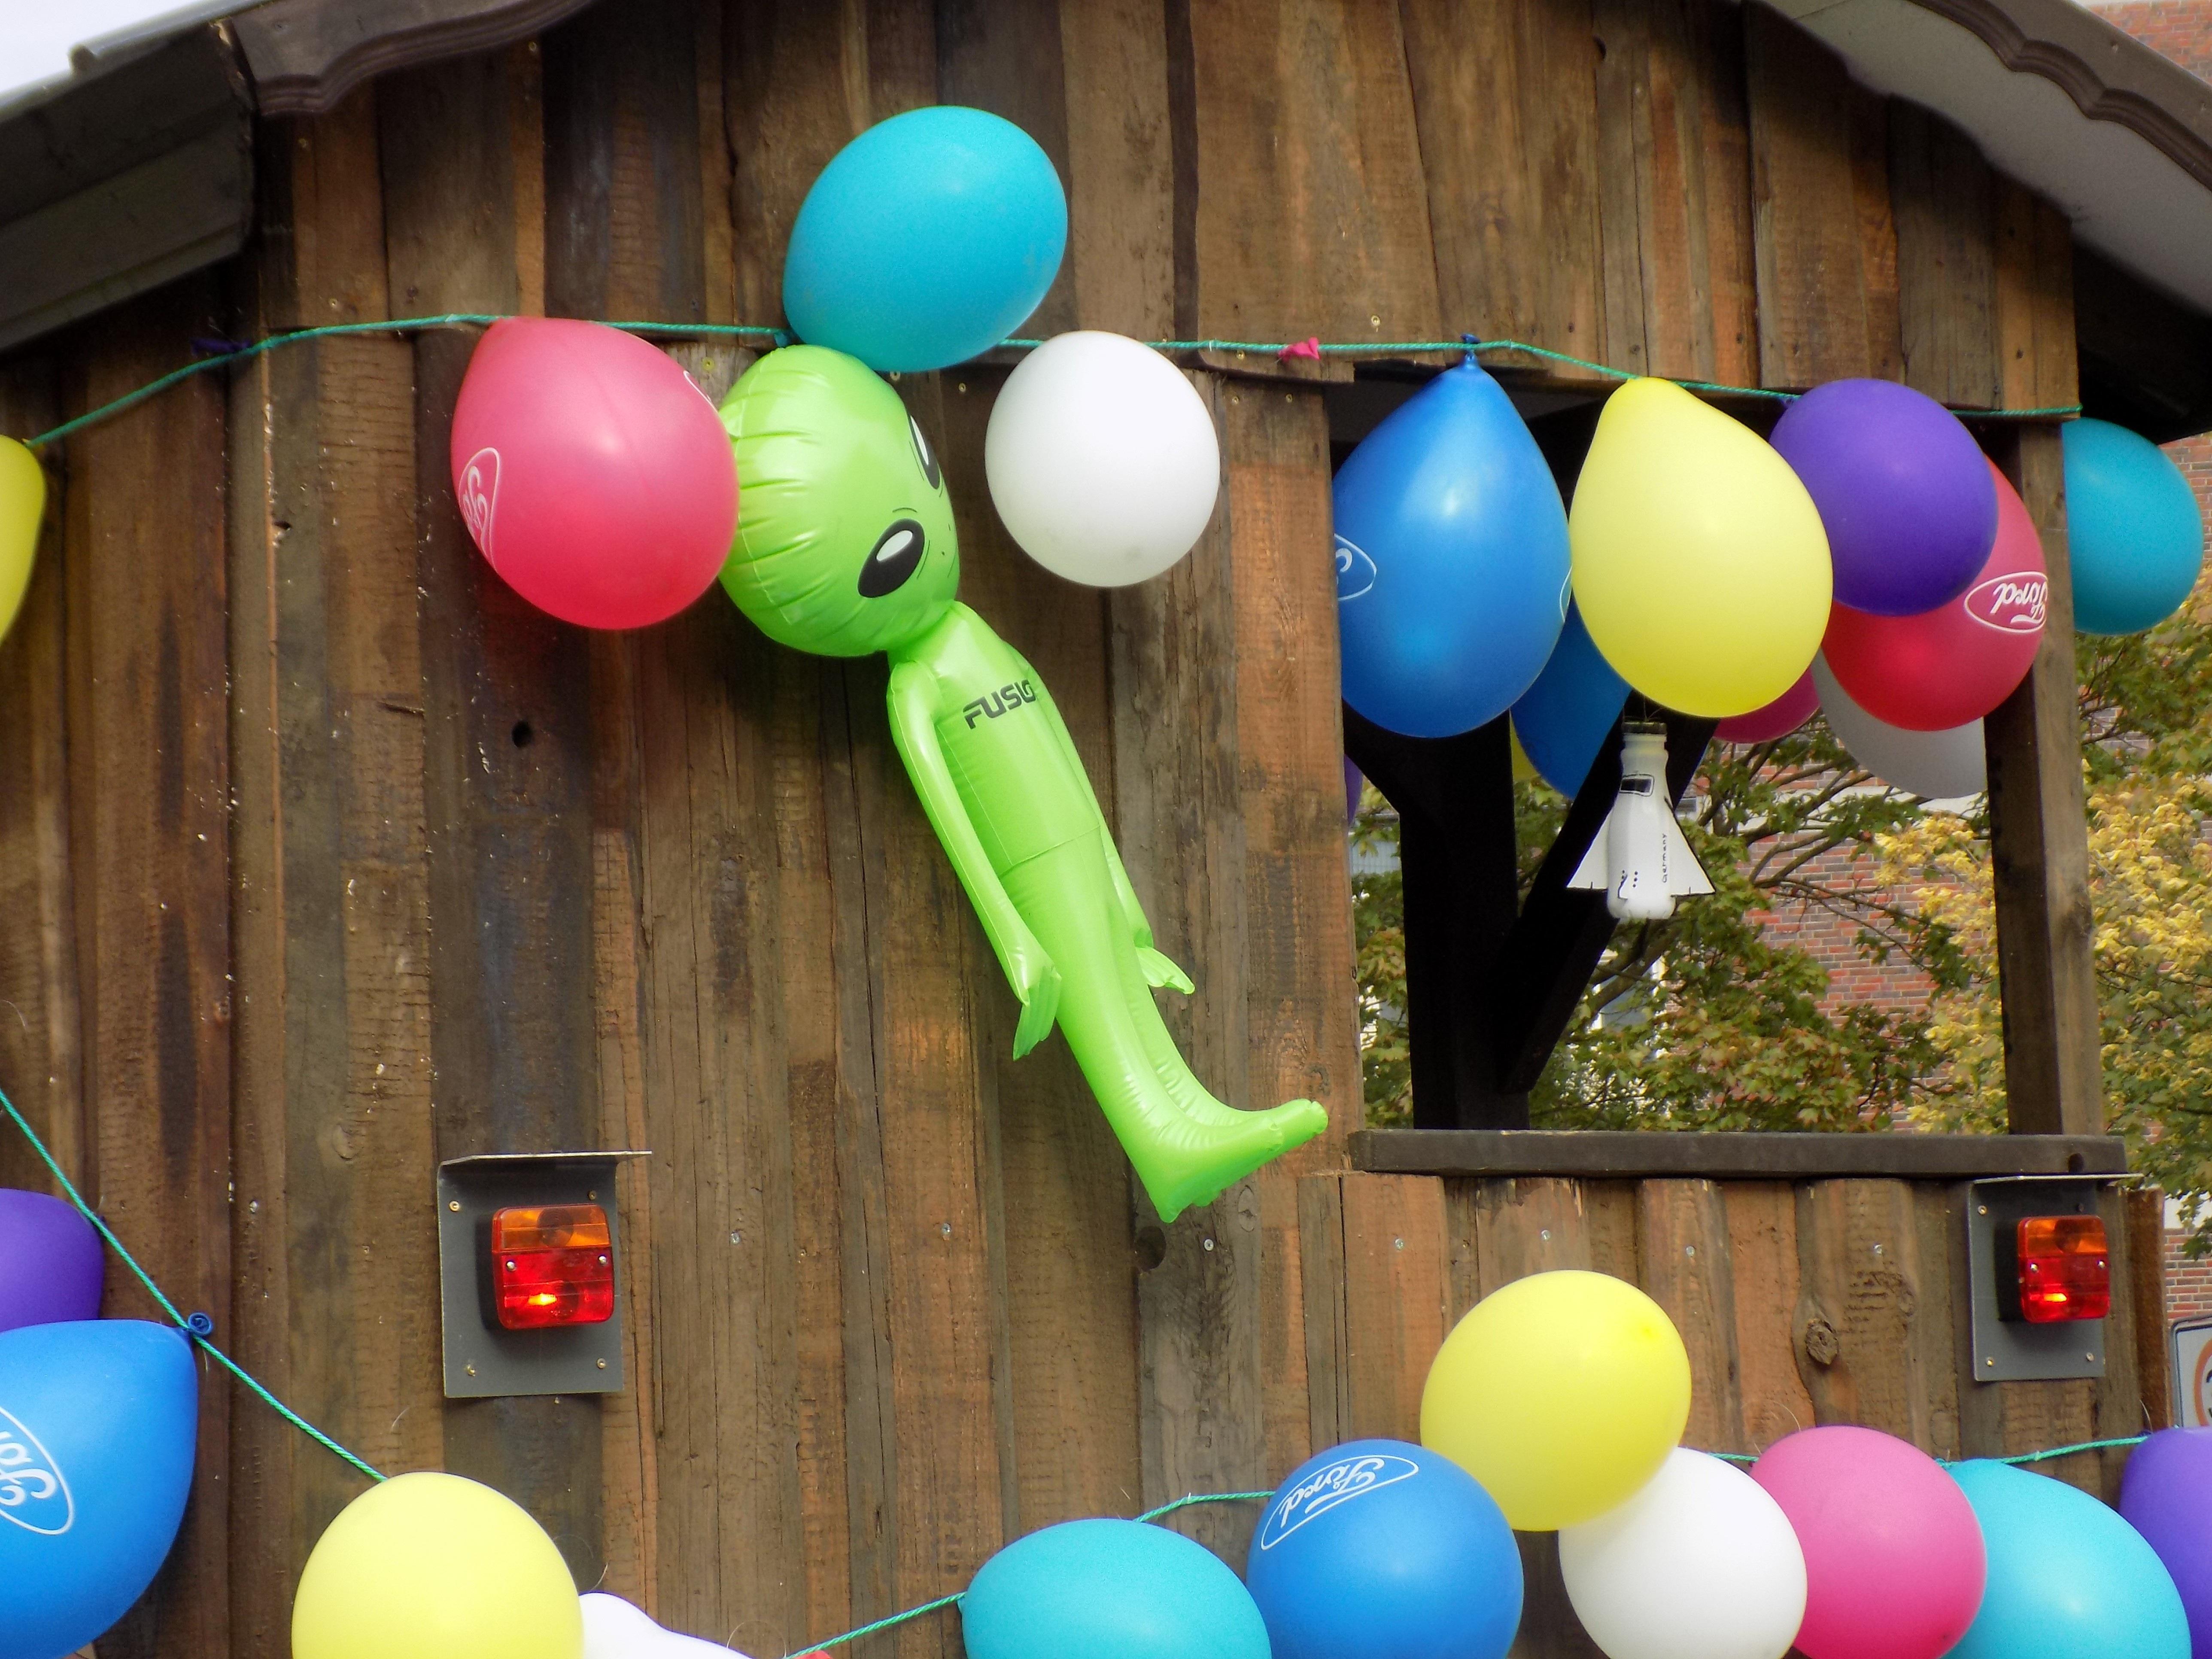 Kostenlose foto : spielen, Ballon, Grün, Karneval, Farbe, blau ...